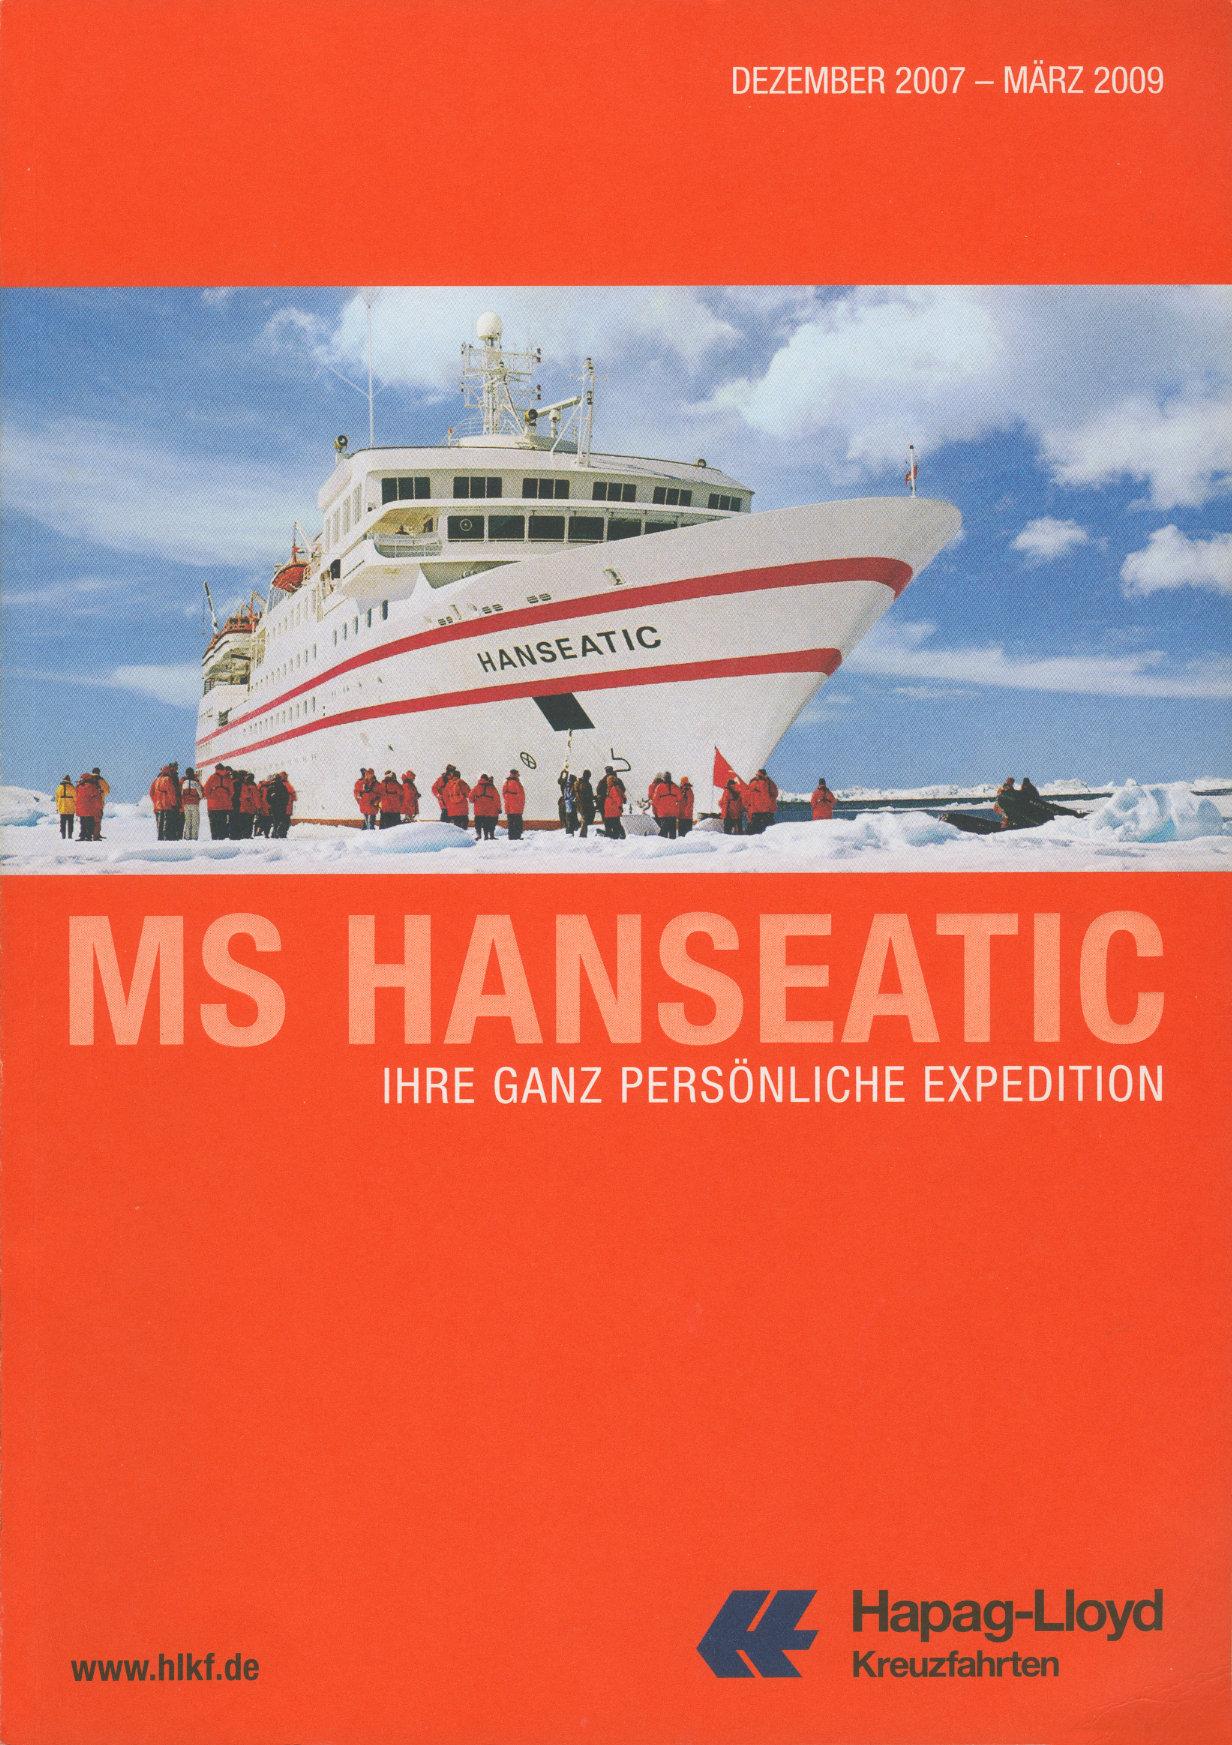 Hapag-Lloyd Kreuzfahrten / MS Hanseatic Katalog